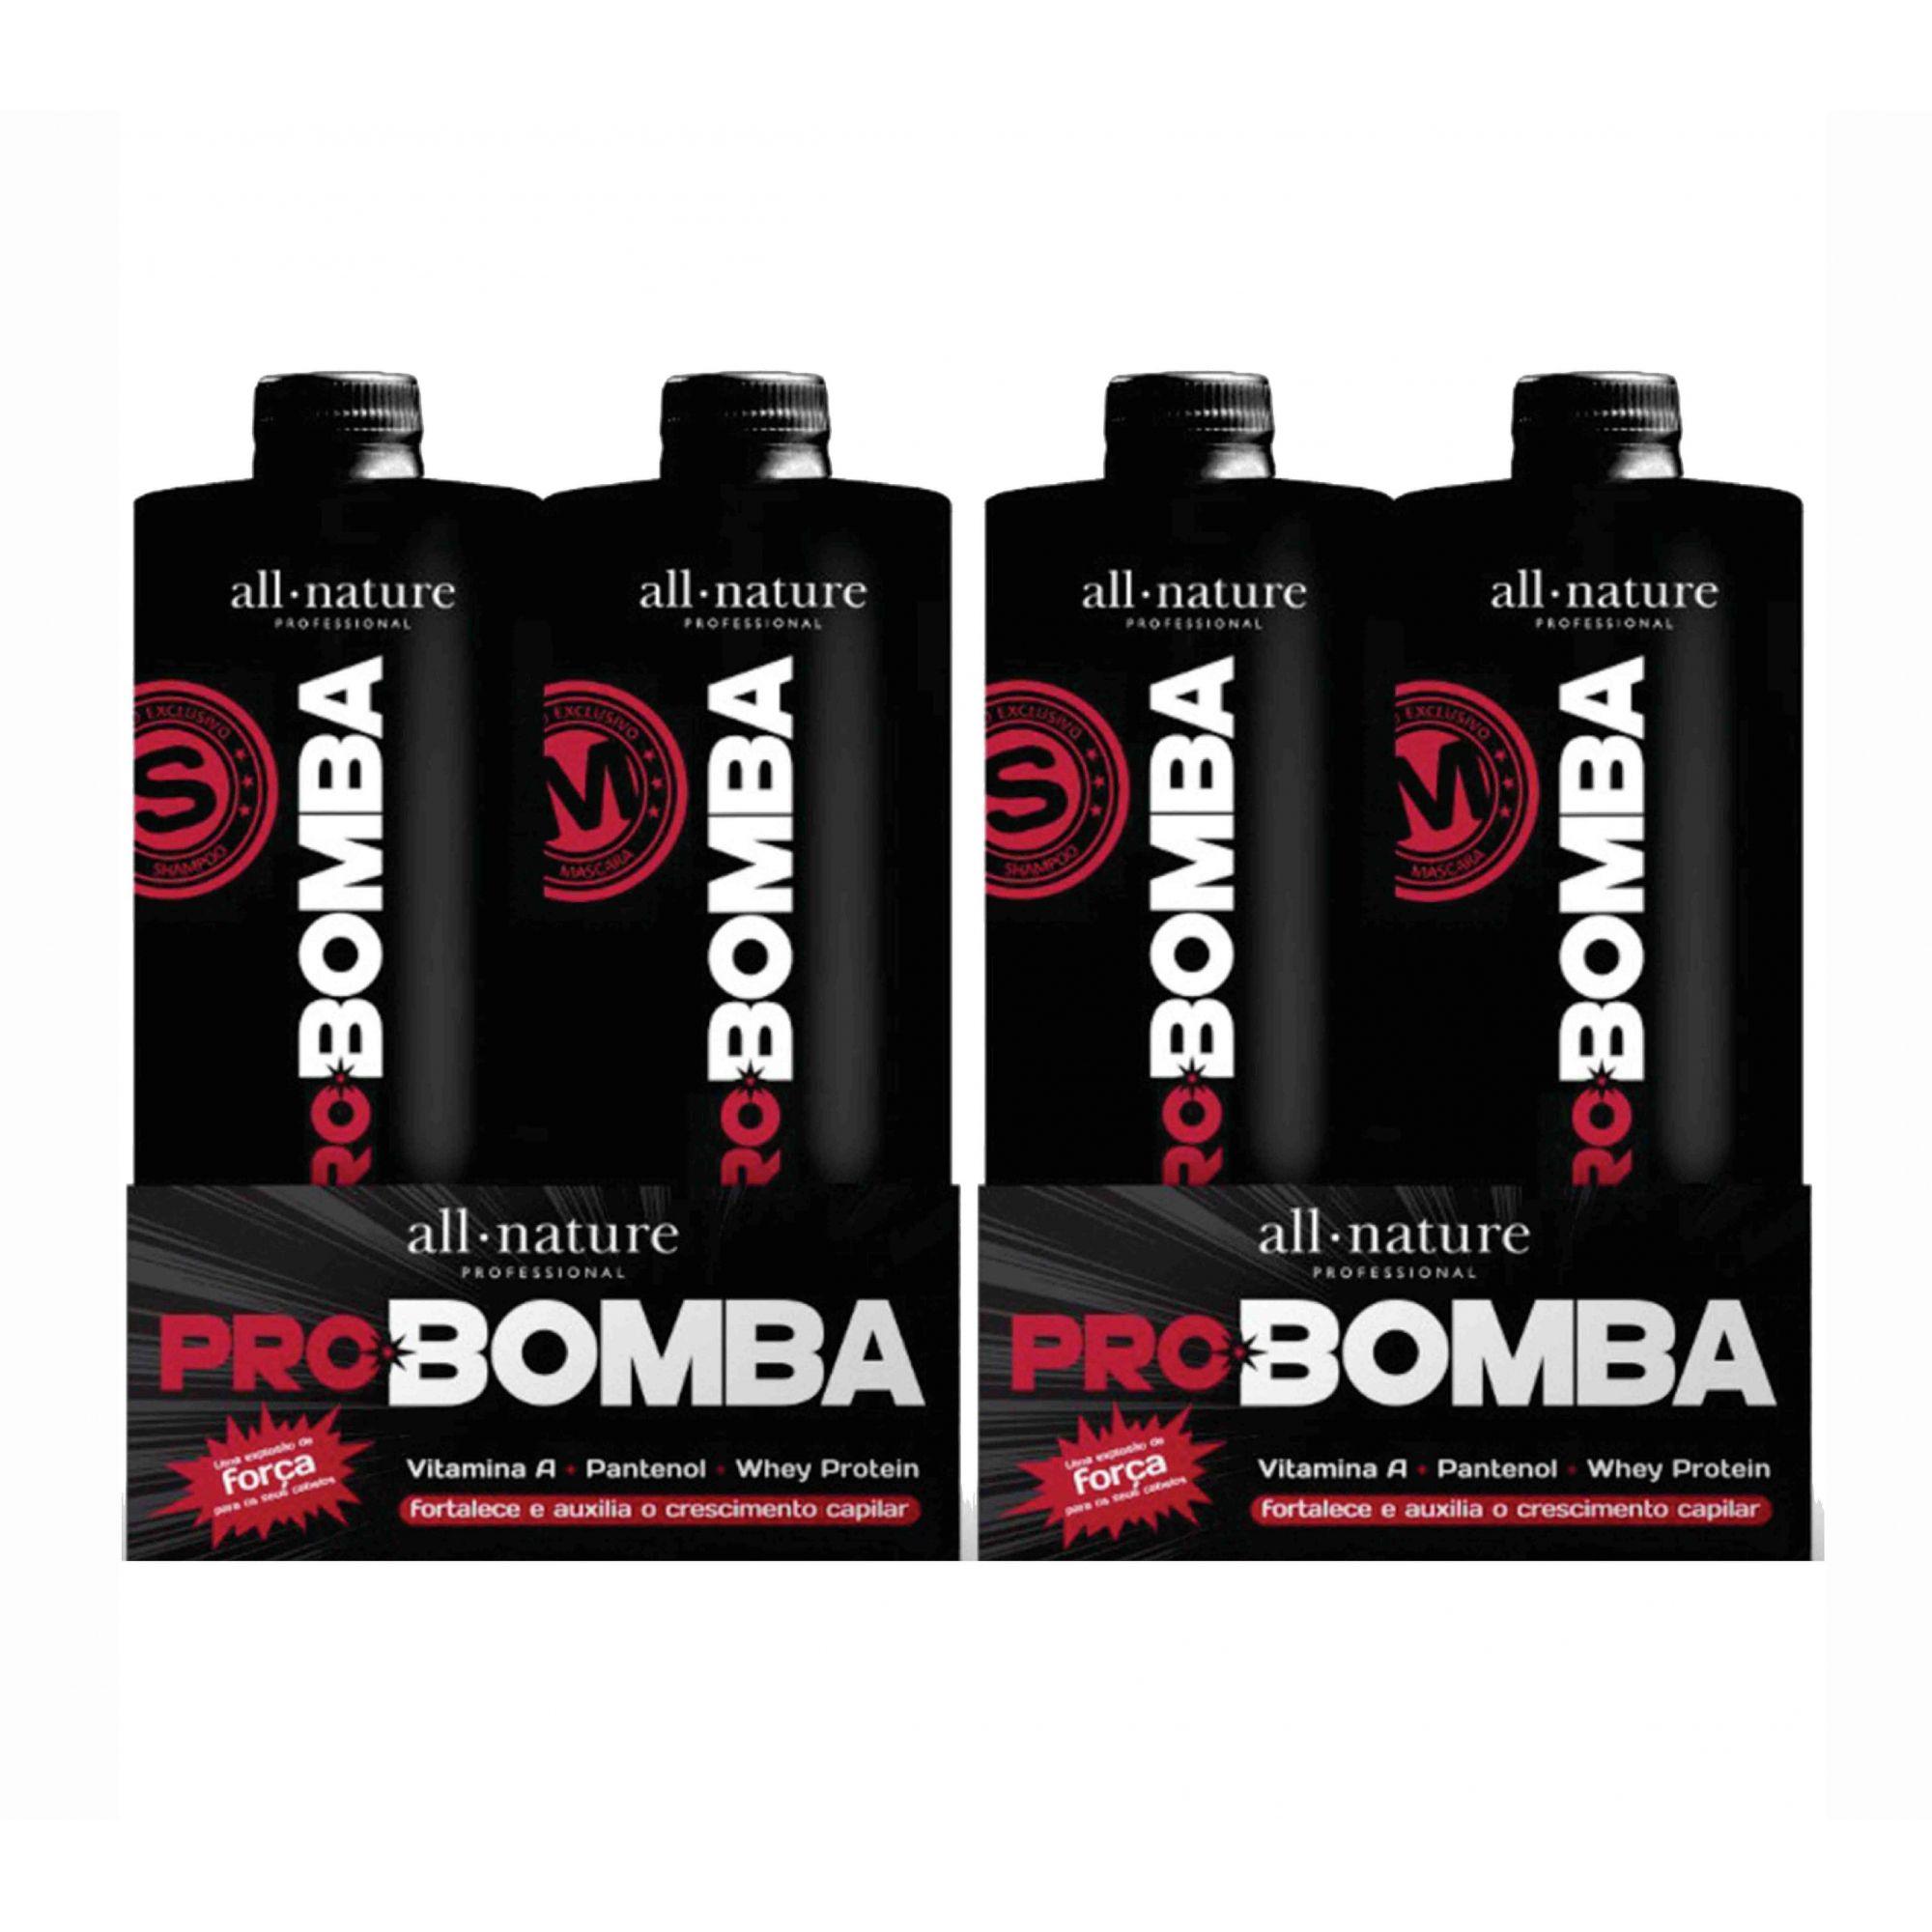 All Nature Kit Pro Bomba Força e Crescimento, Contém Vitamina A, Pantenol, Whey protein e Mix de Aminoácidos 2 Kits